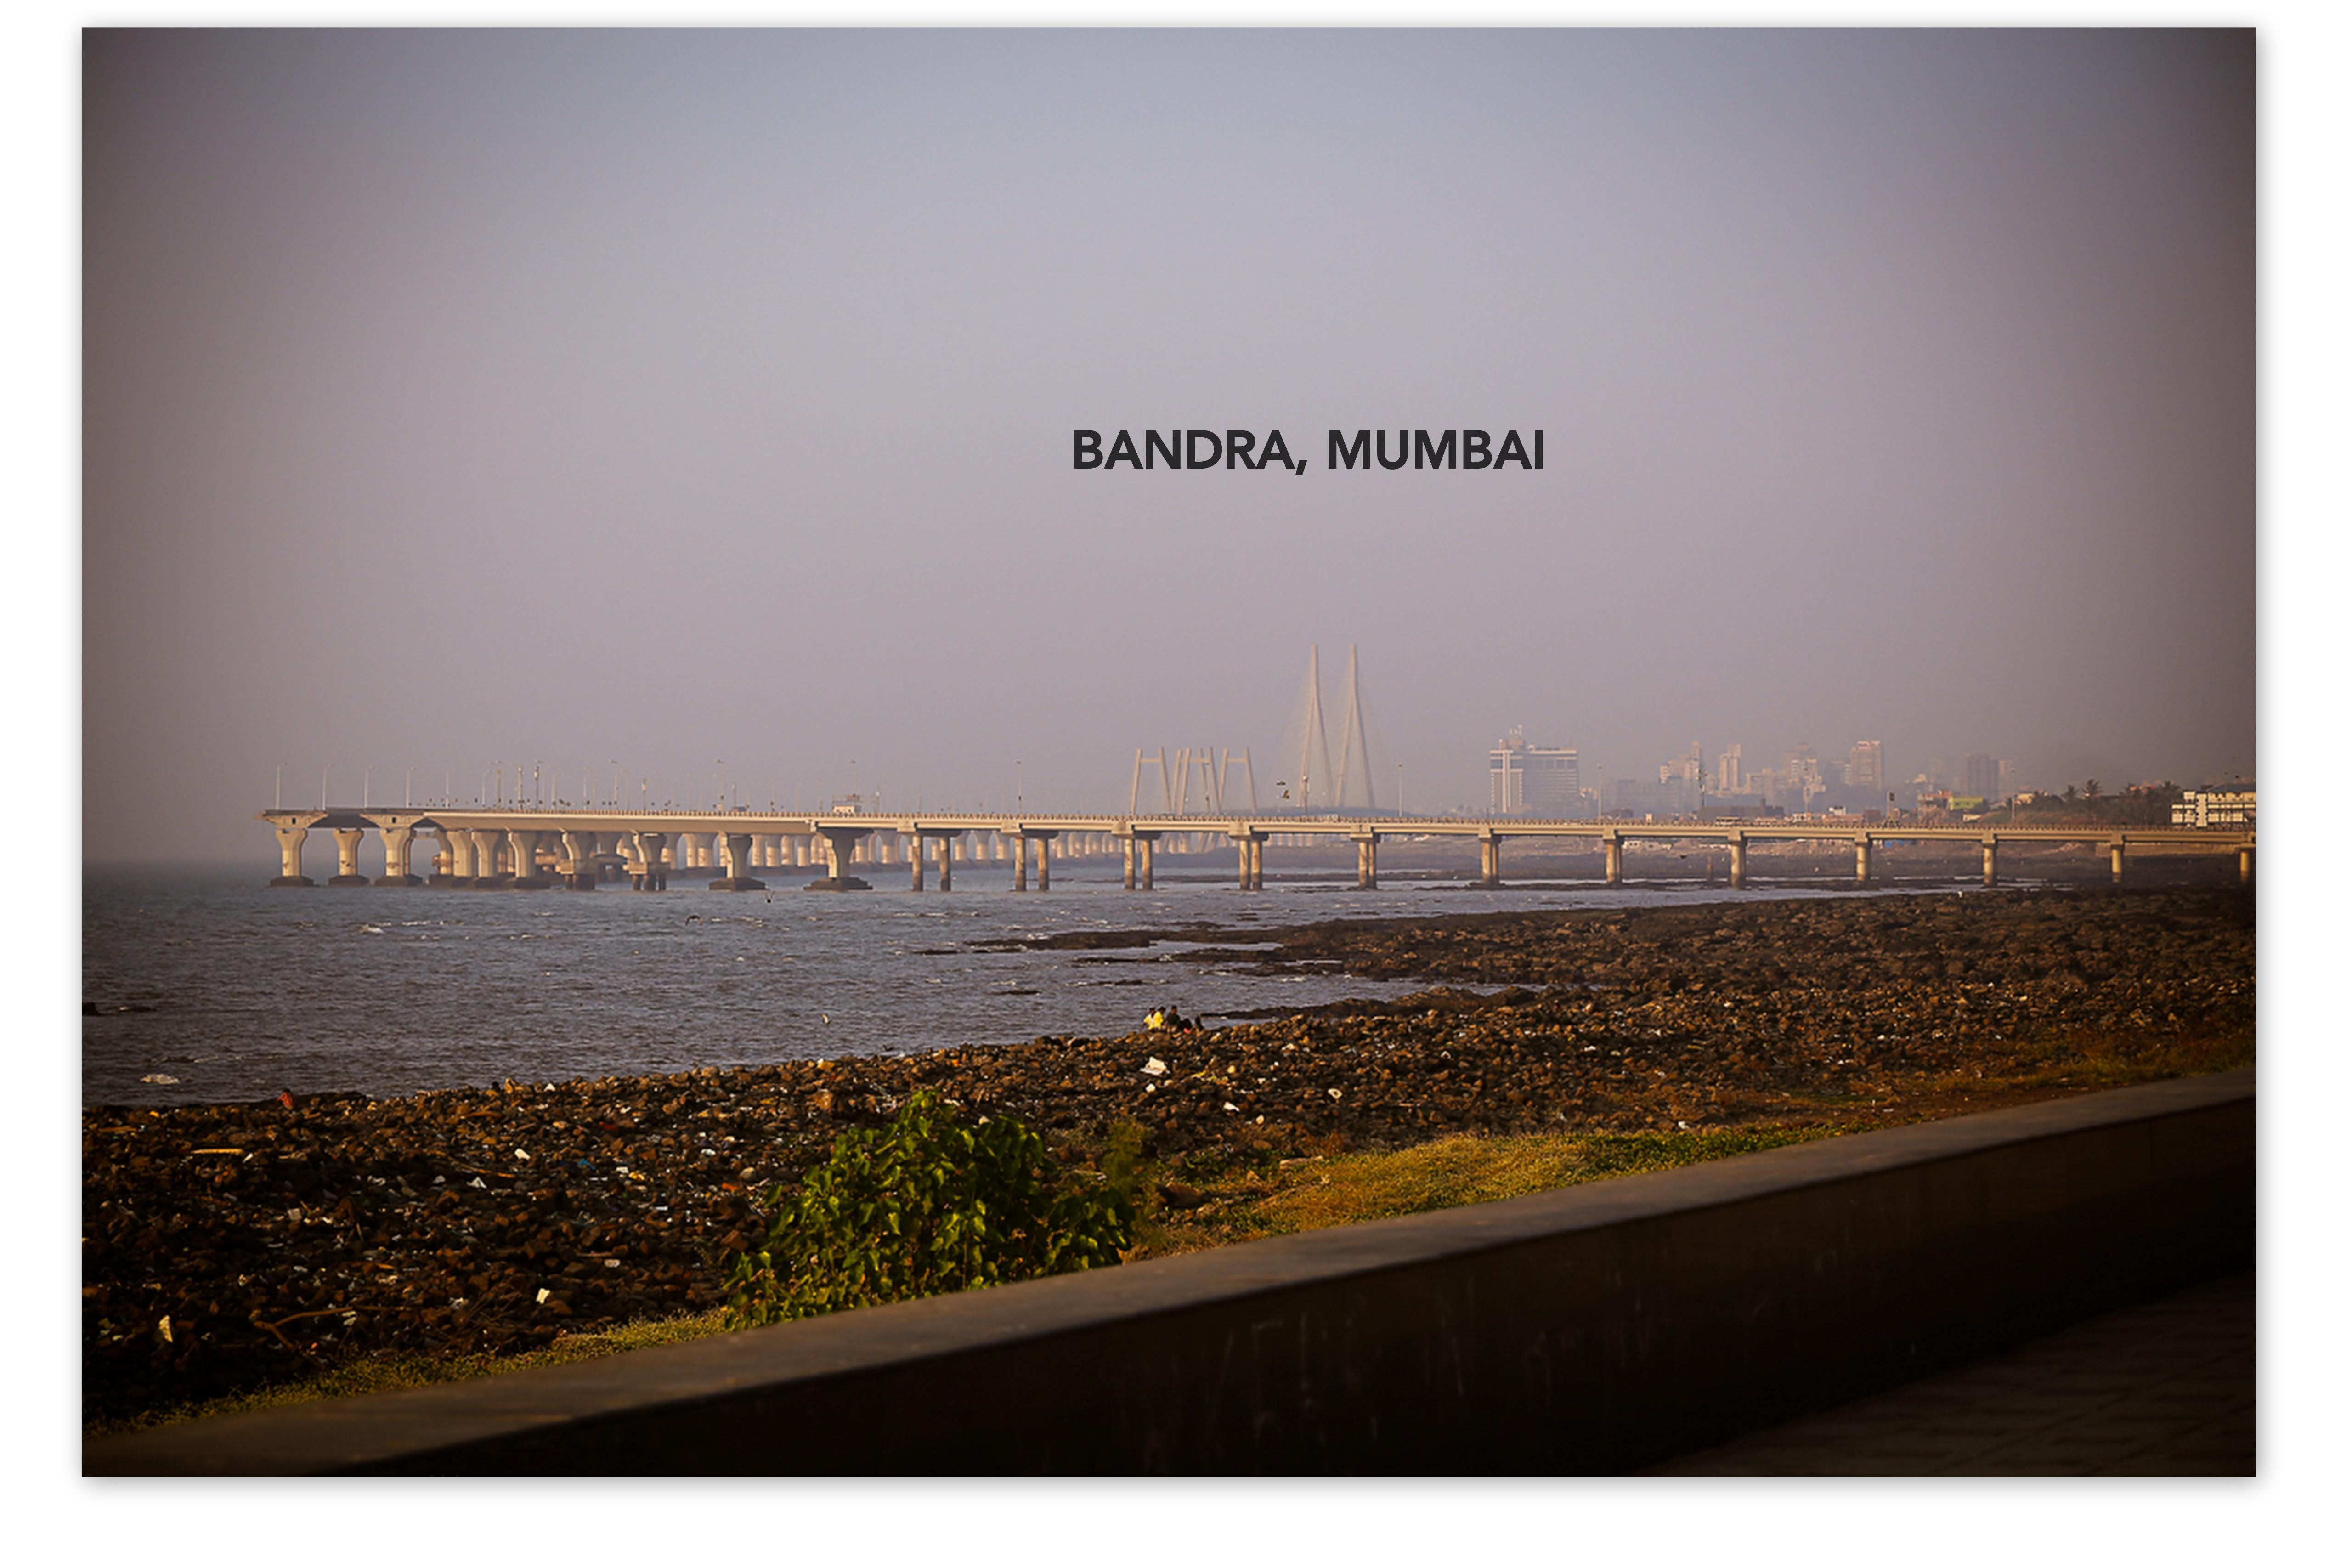 Mumbai, CST, Juhu Chowpatty, Colaba, Bandra, Worli Sealink, Marine Lines, Shivaji Park, Dadar, Street Food, Incredible India, Bombay, Travel, Travelblog,